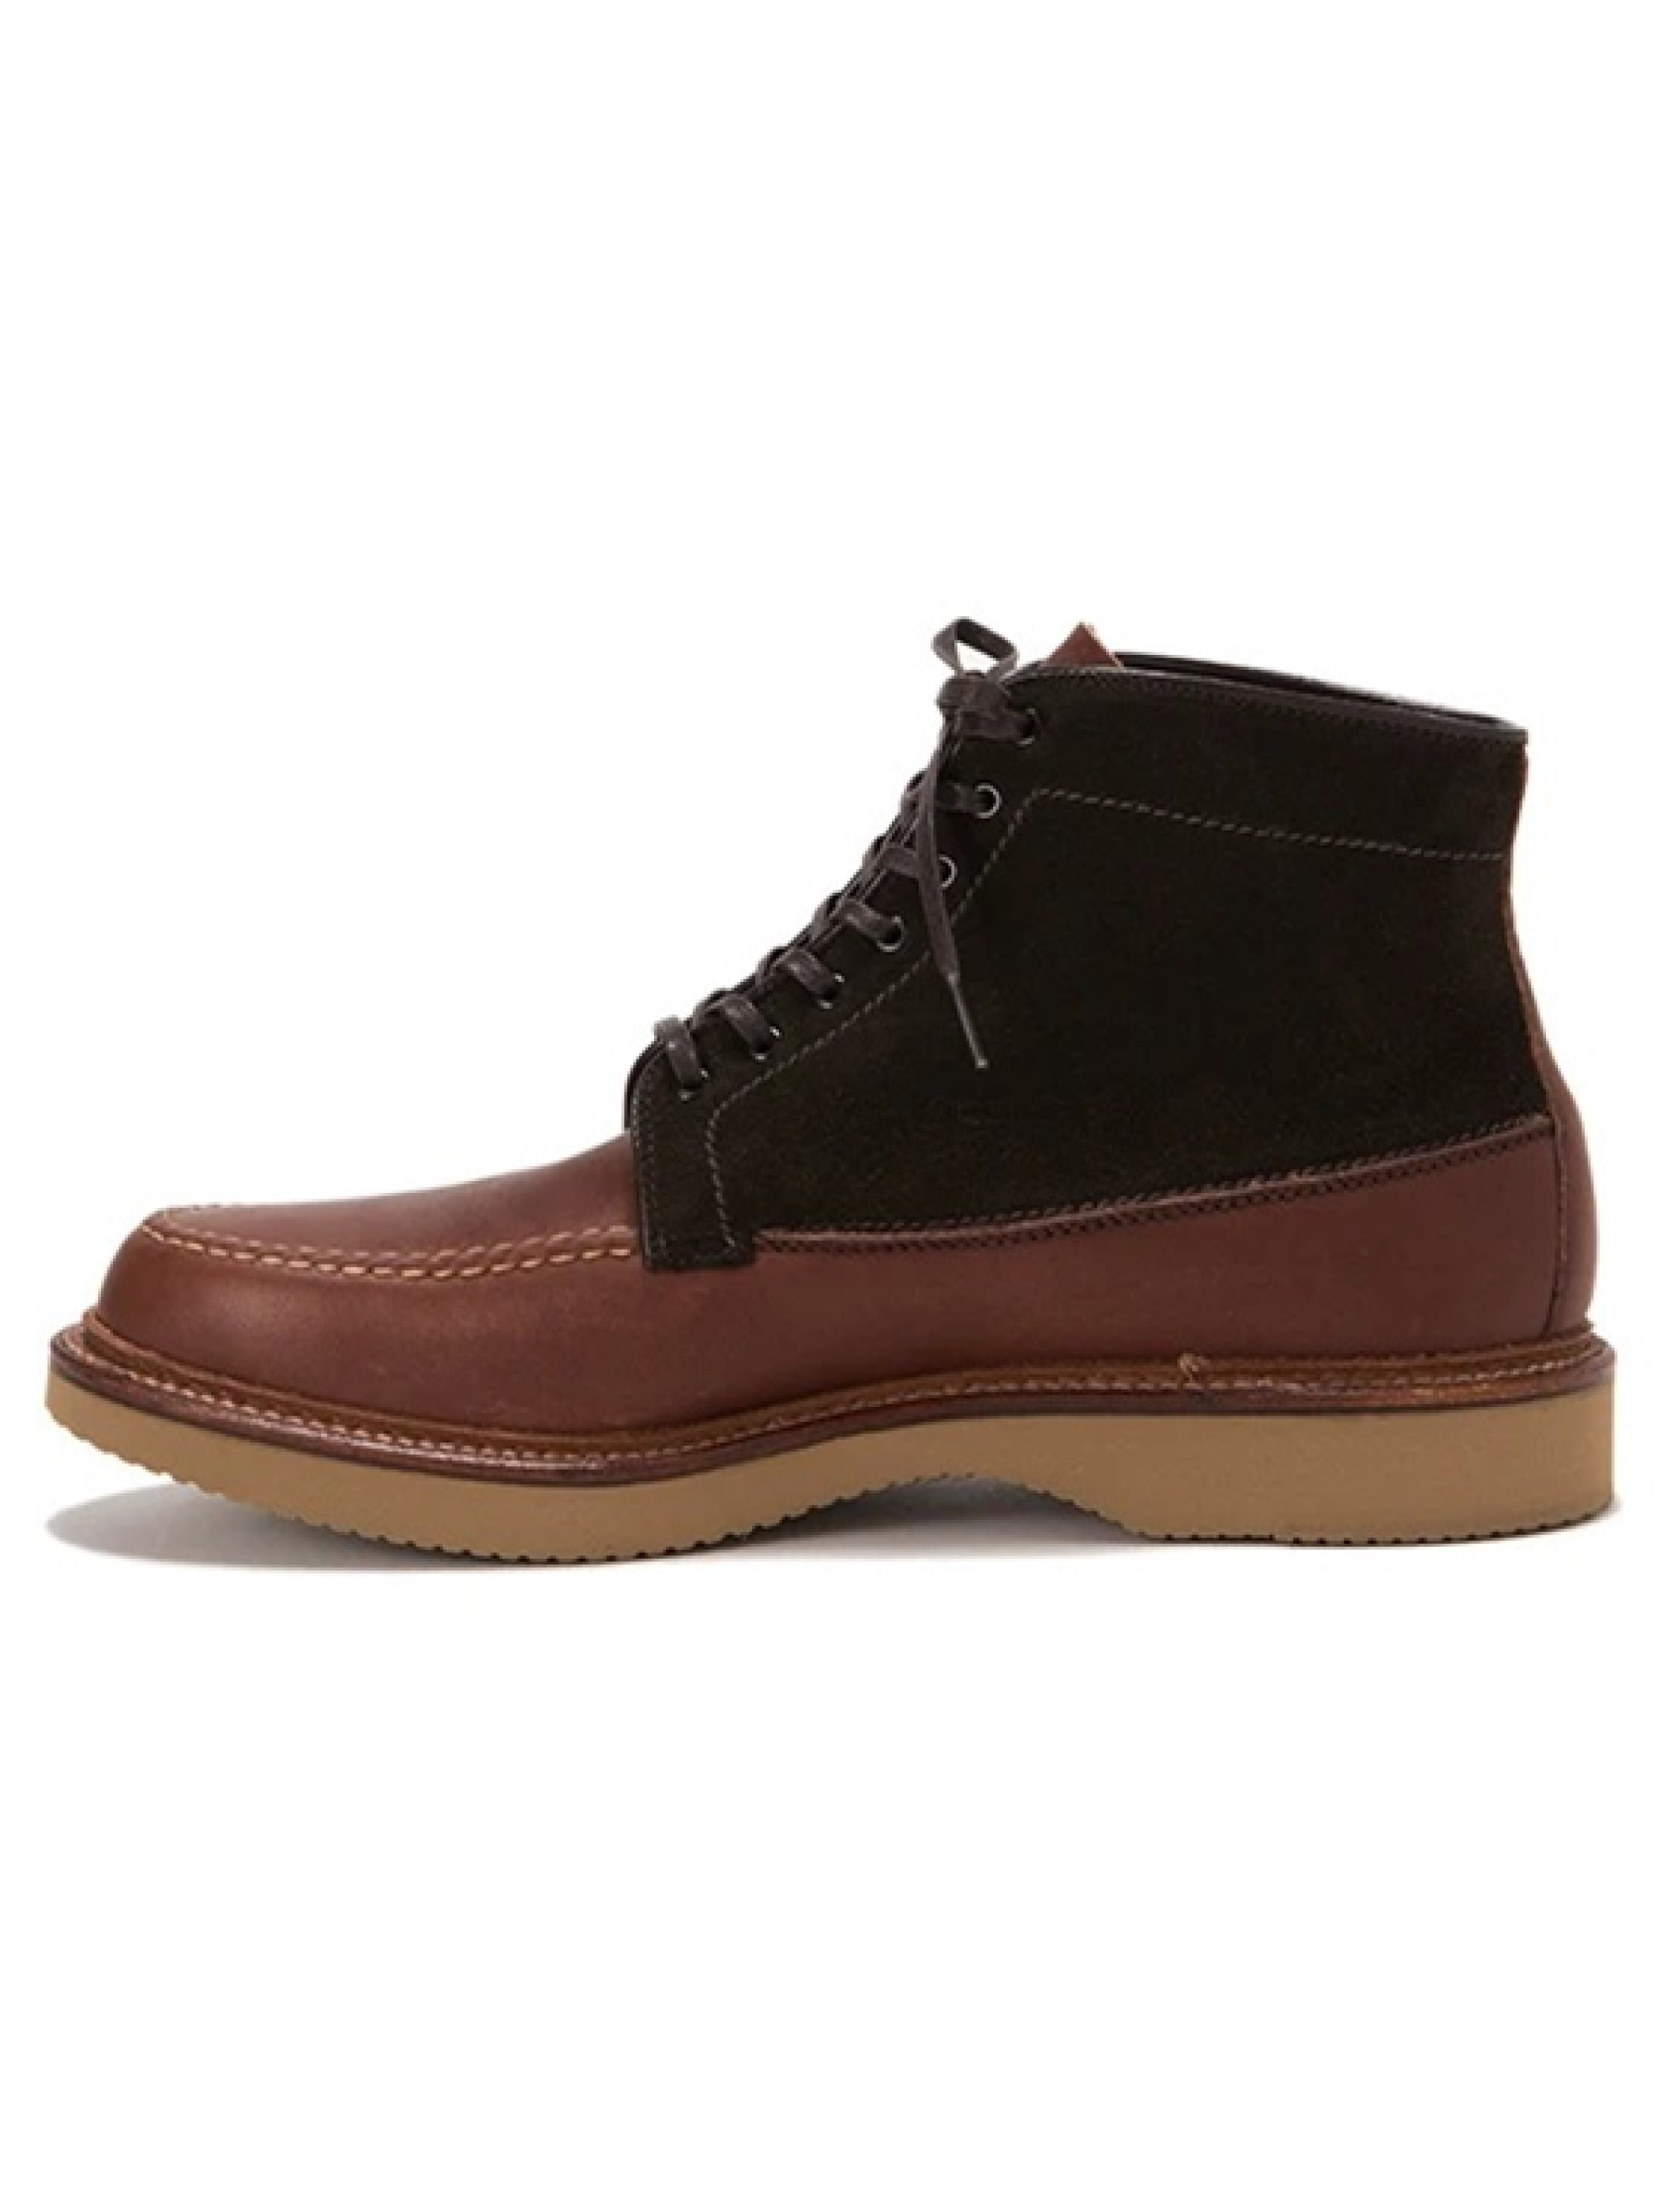 ALDEN | Michigan Boots